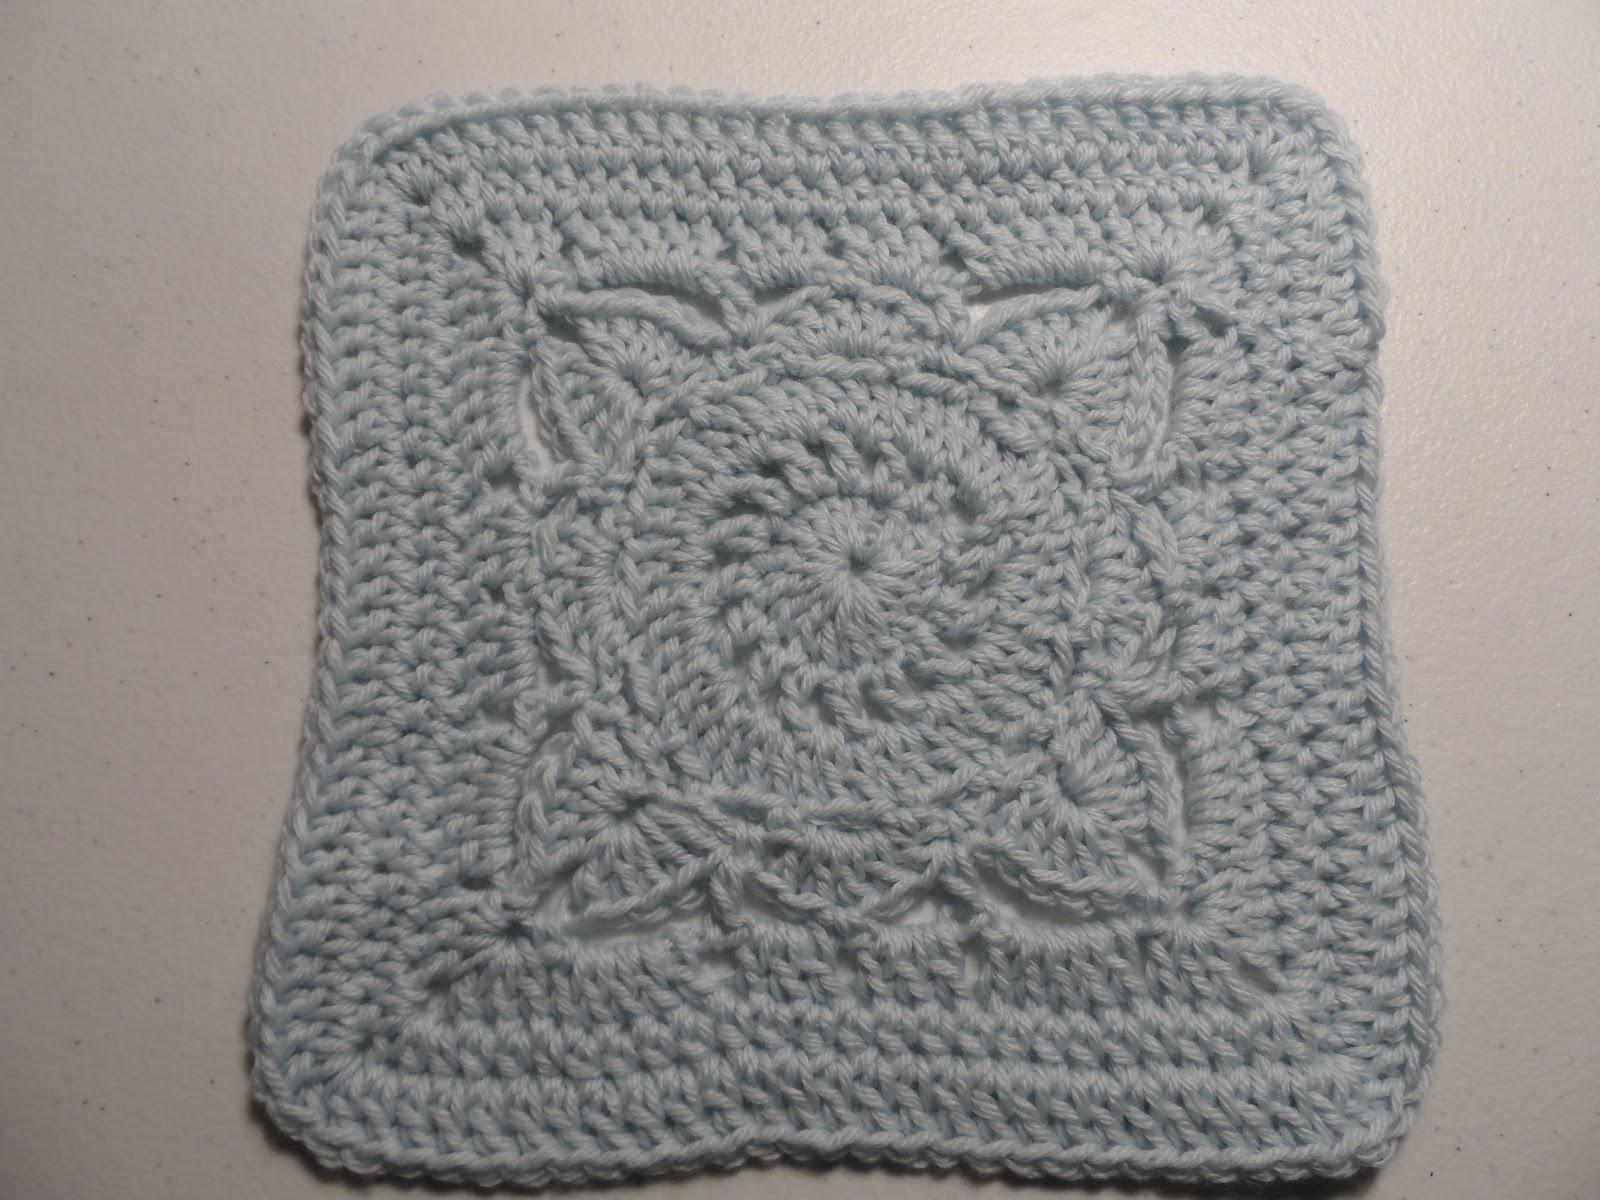 The Knitty Crocheter: Hurricane Sandy Relief Baby Blanket